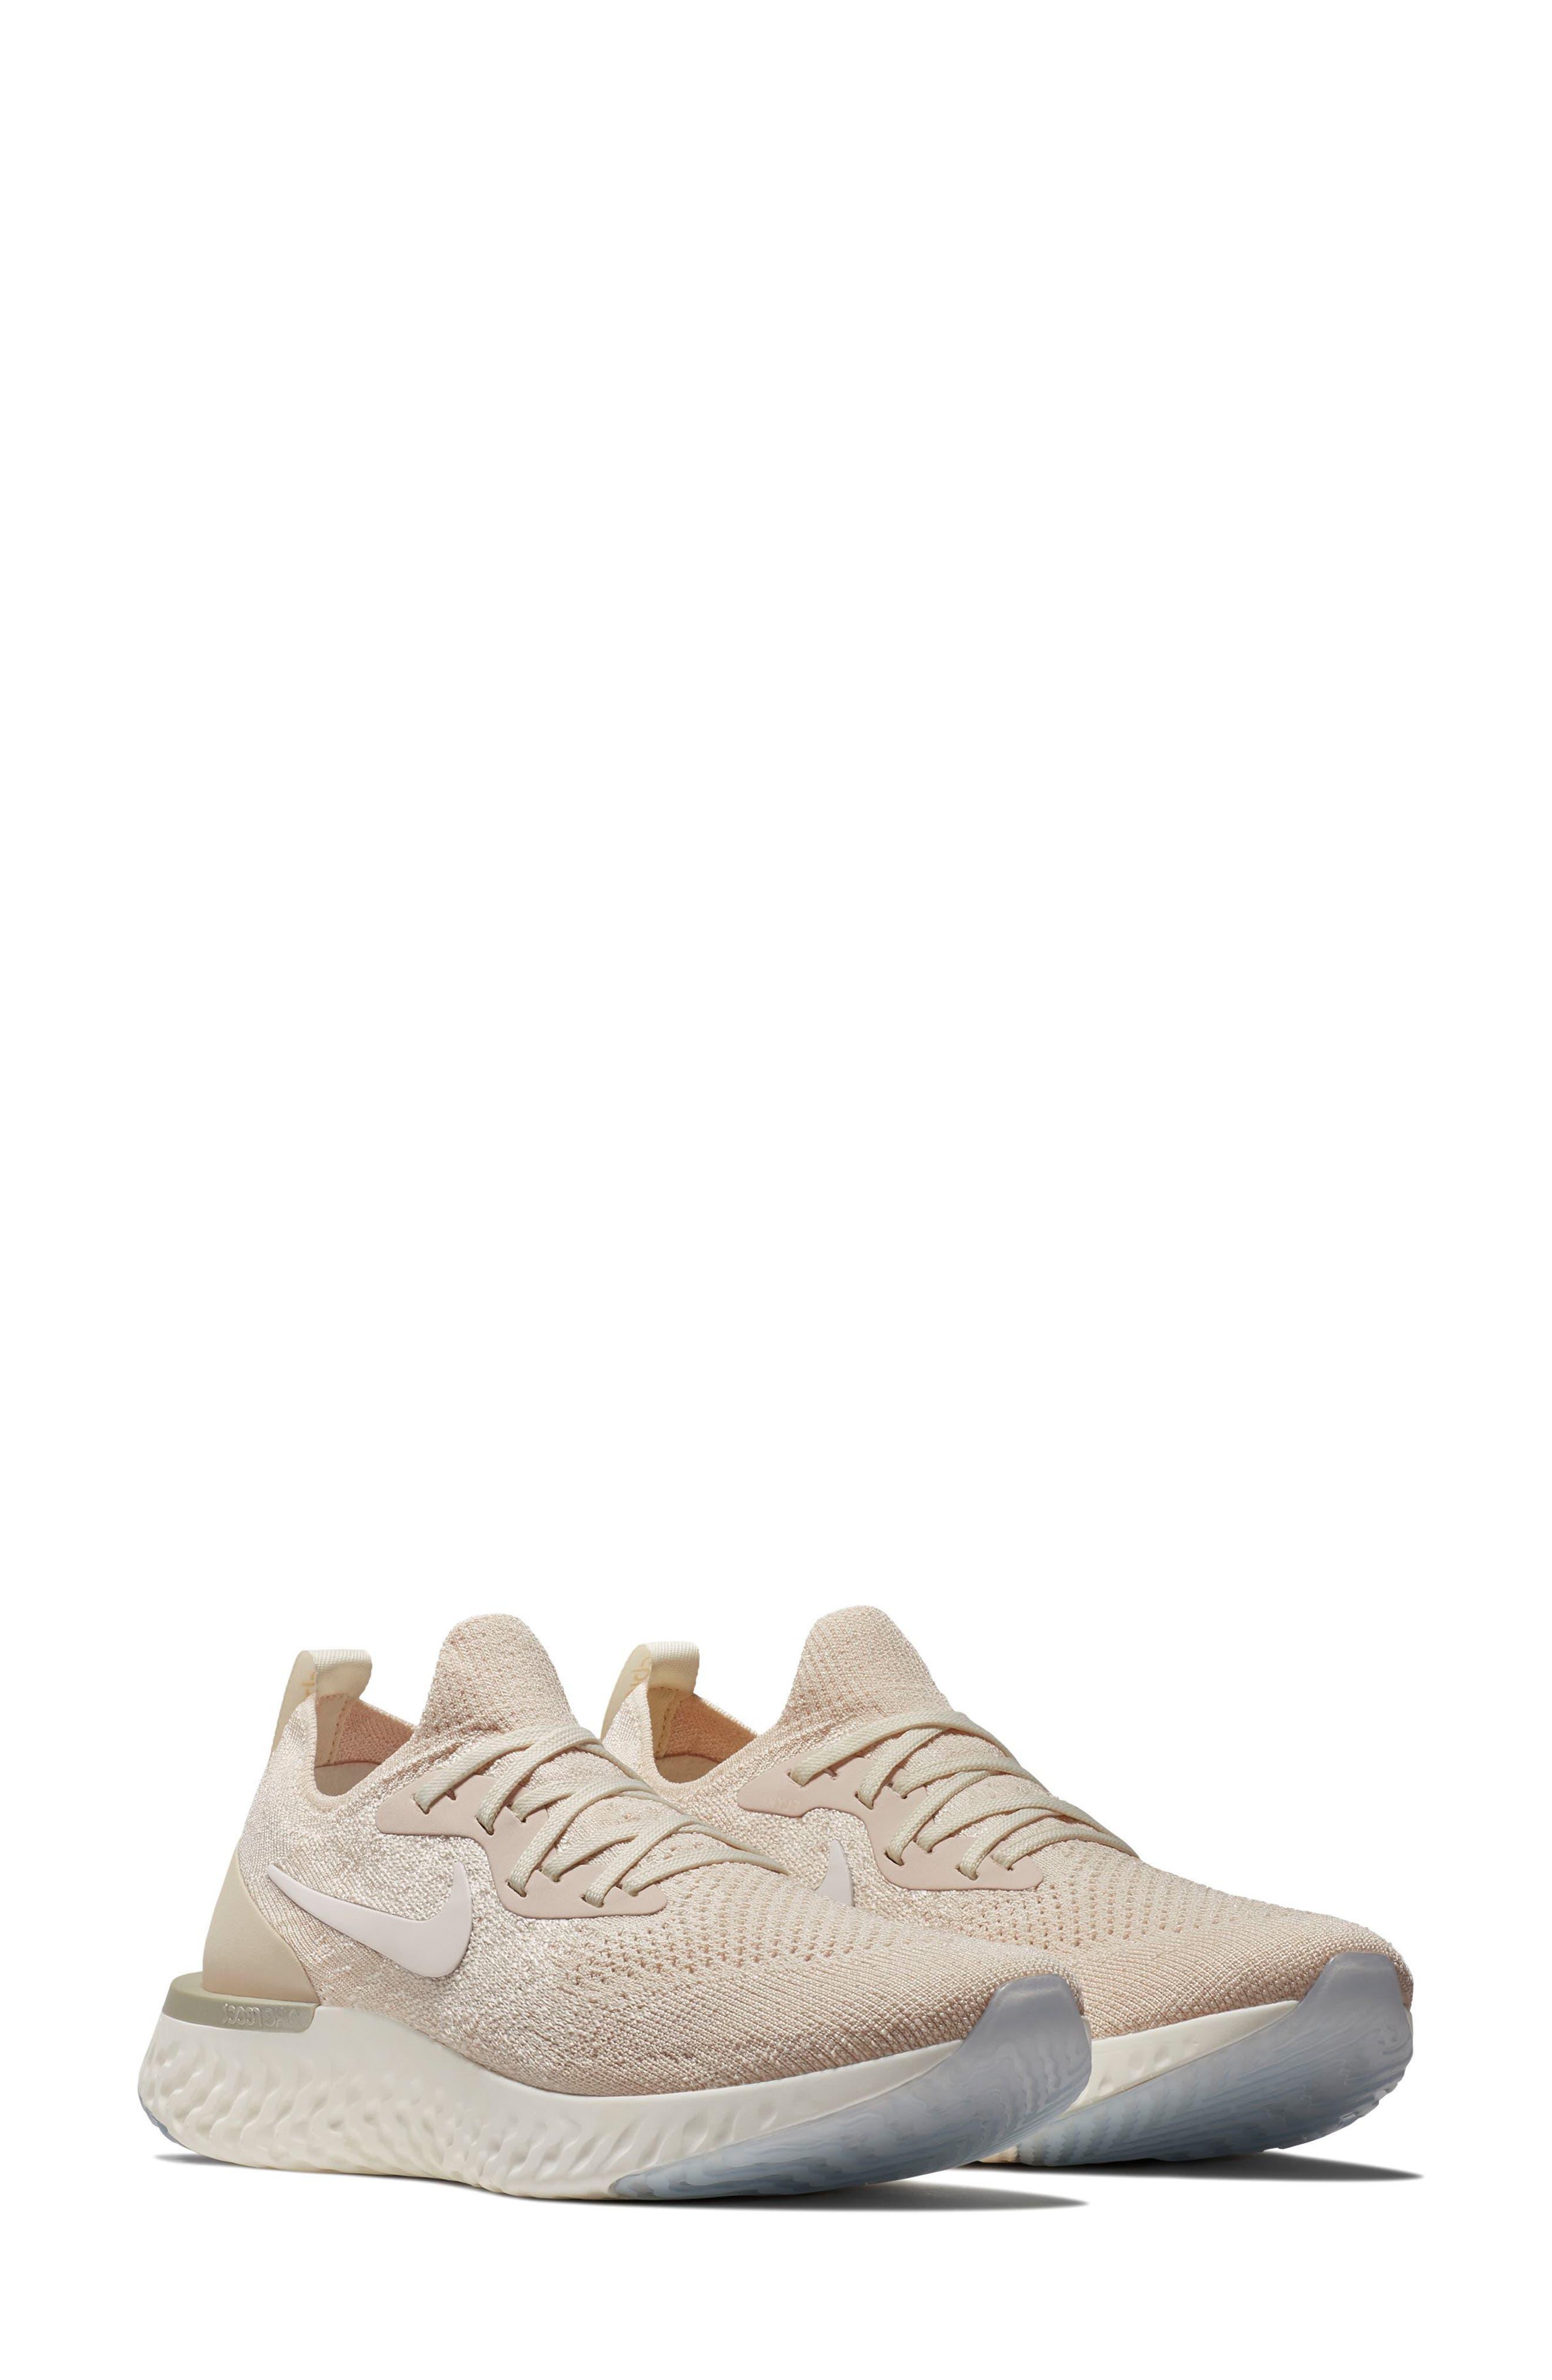 Epic React Flyknit Running Shoe,                         Main,                         color, Light Cream/ Sail